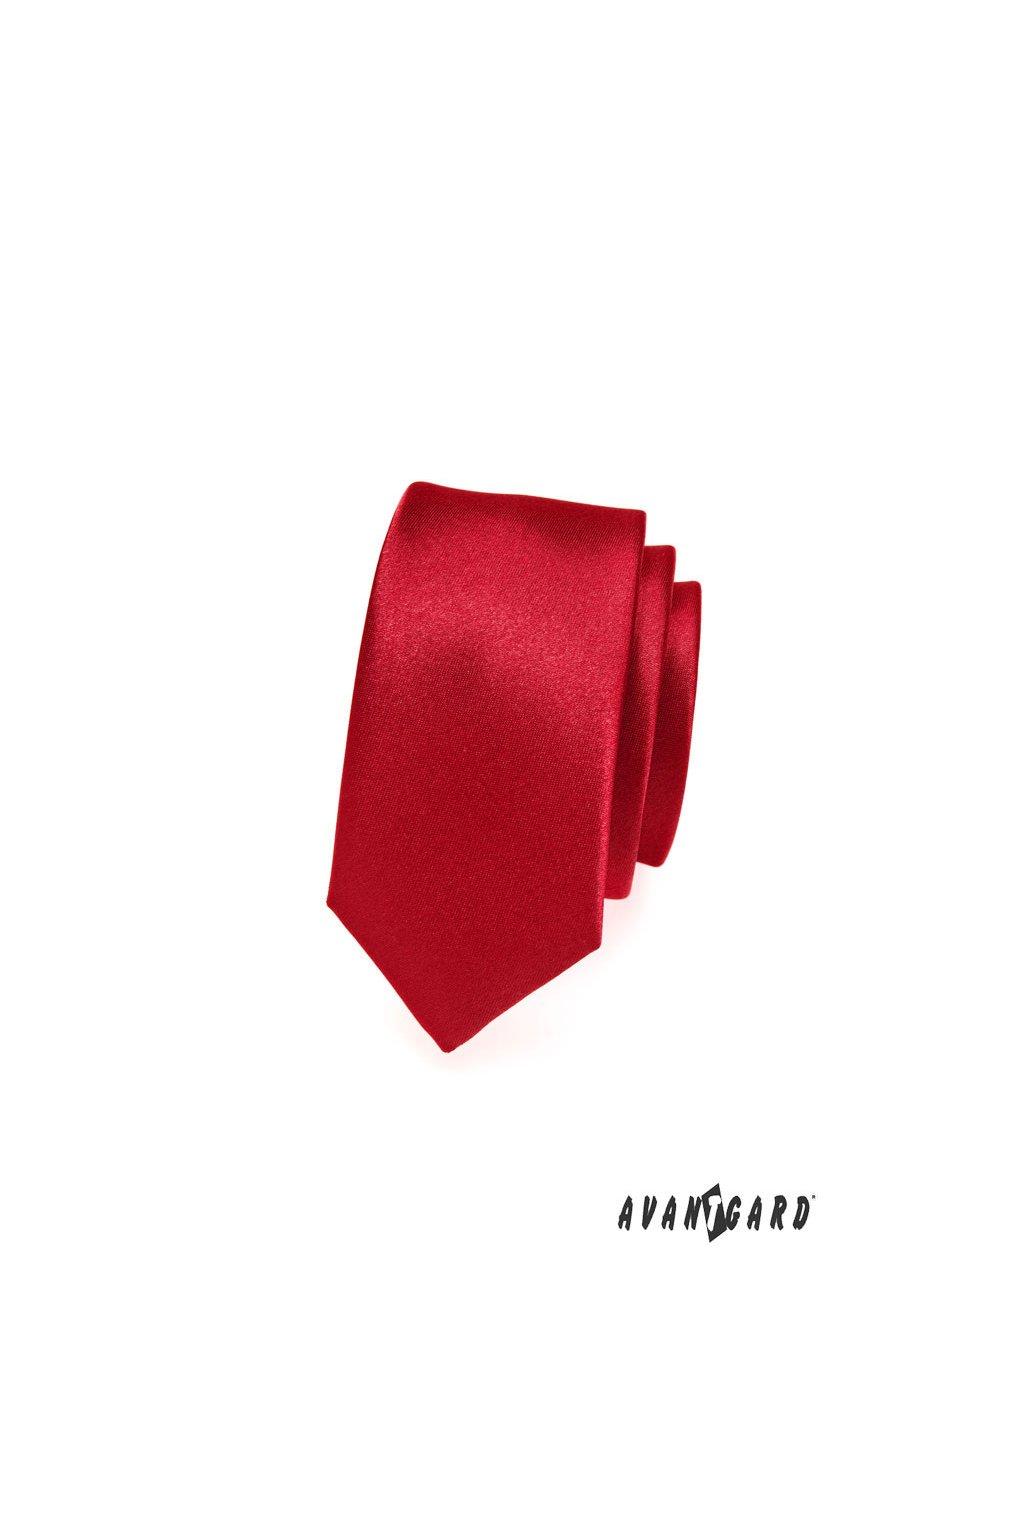 Kravata SLIM LUX červená 571 - 9005